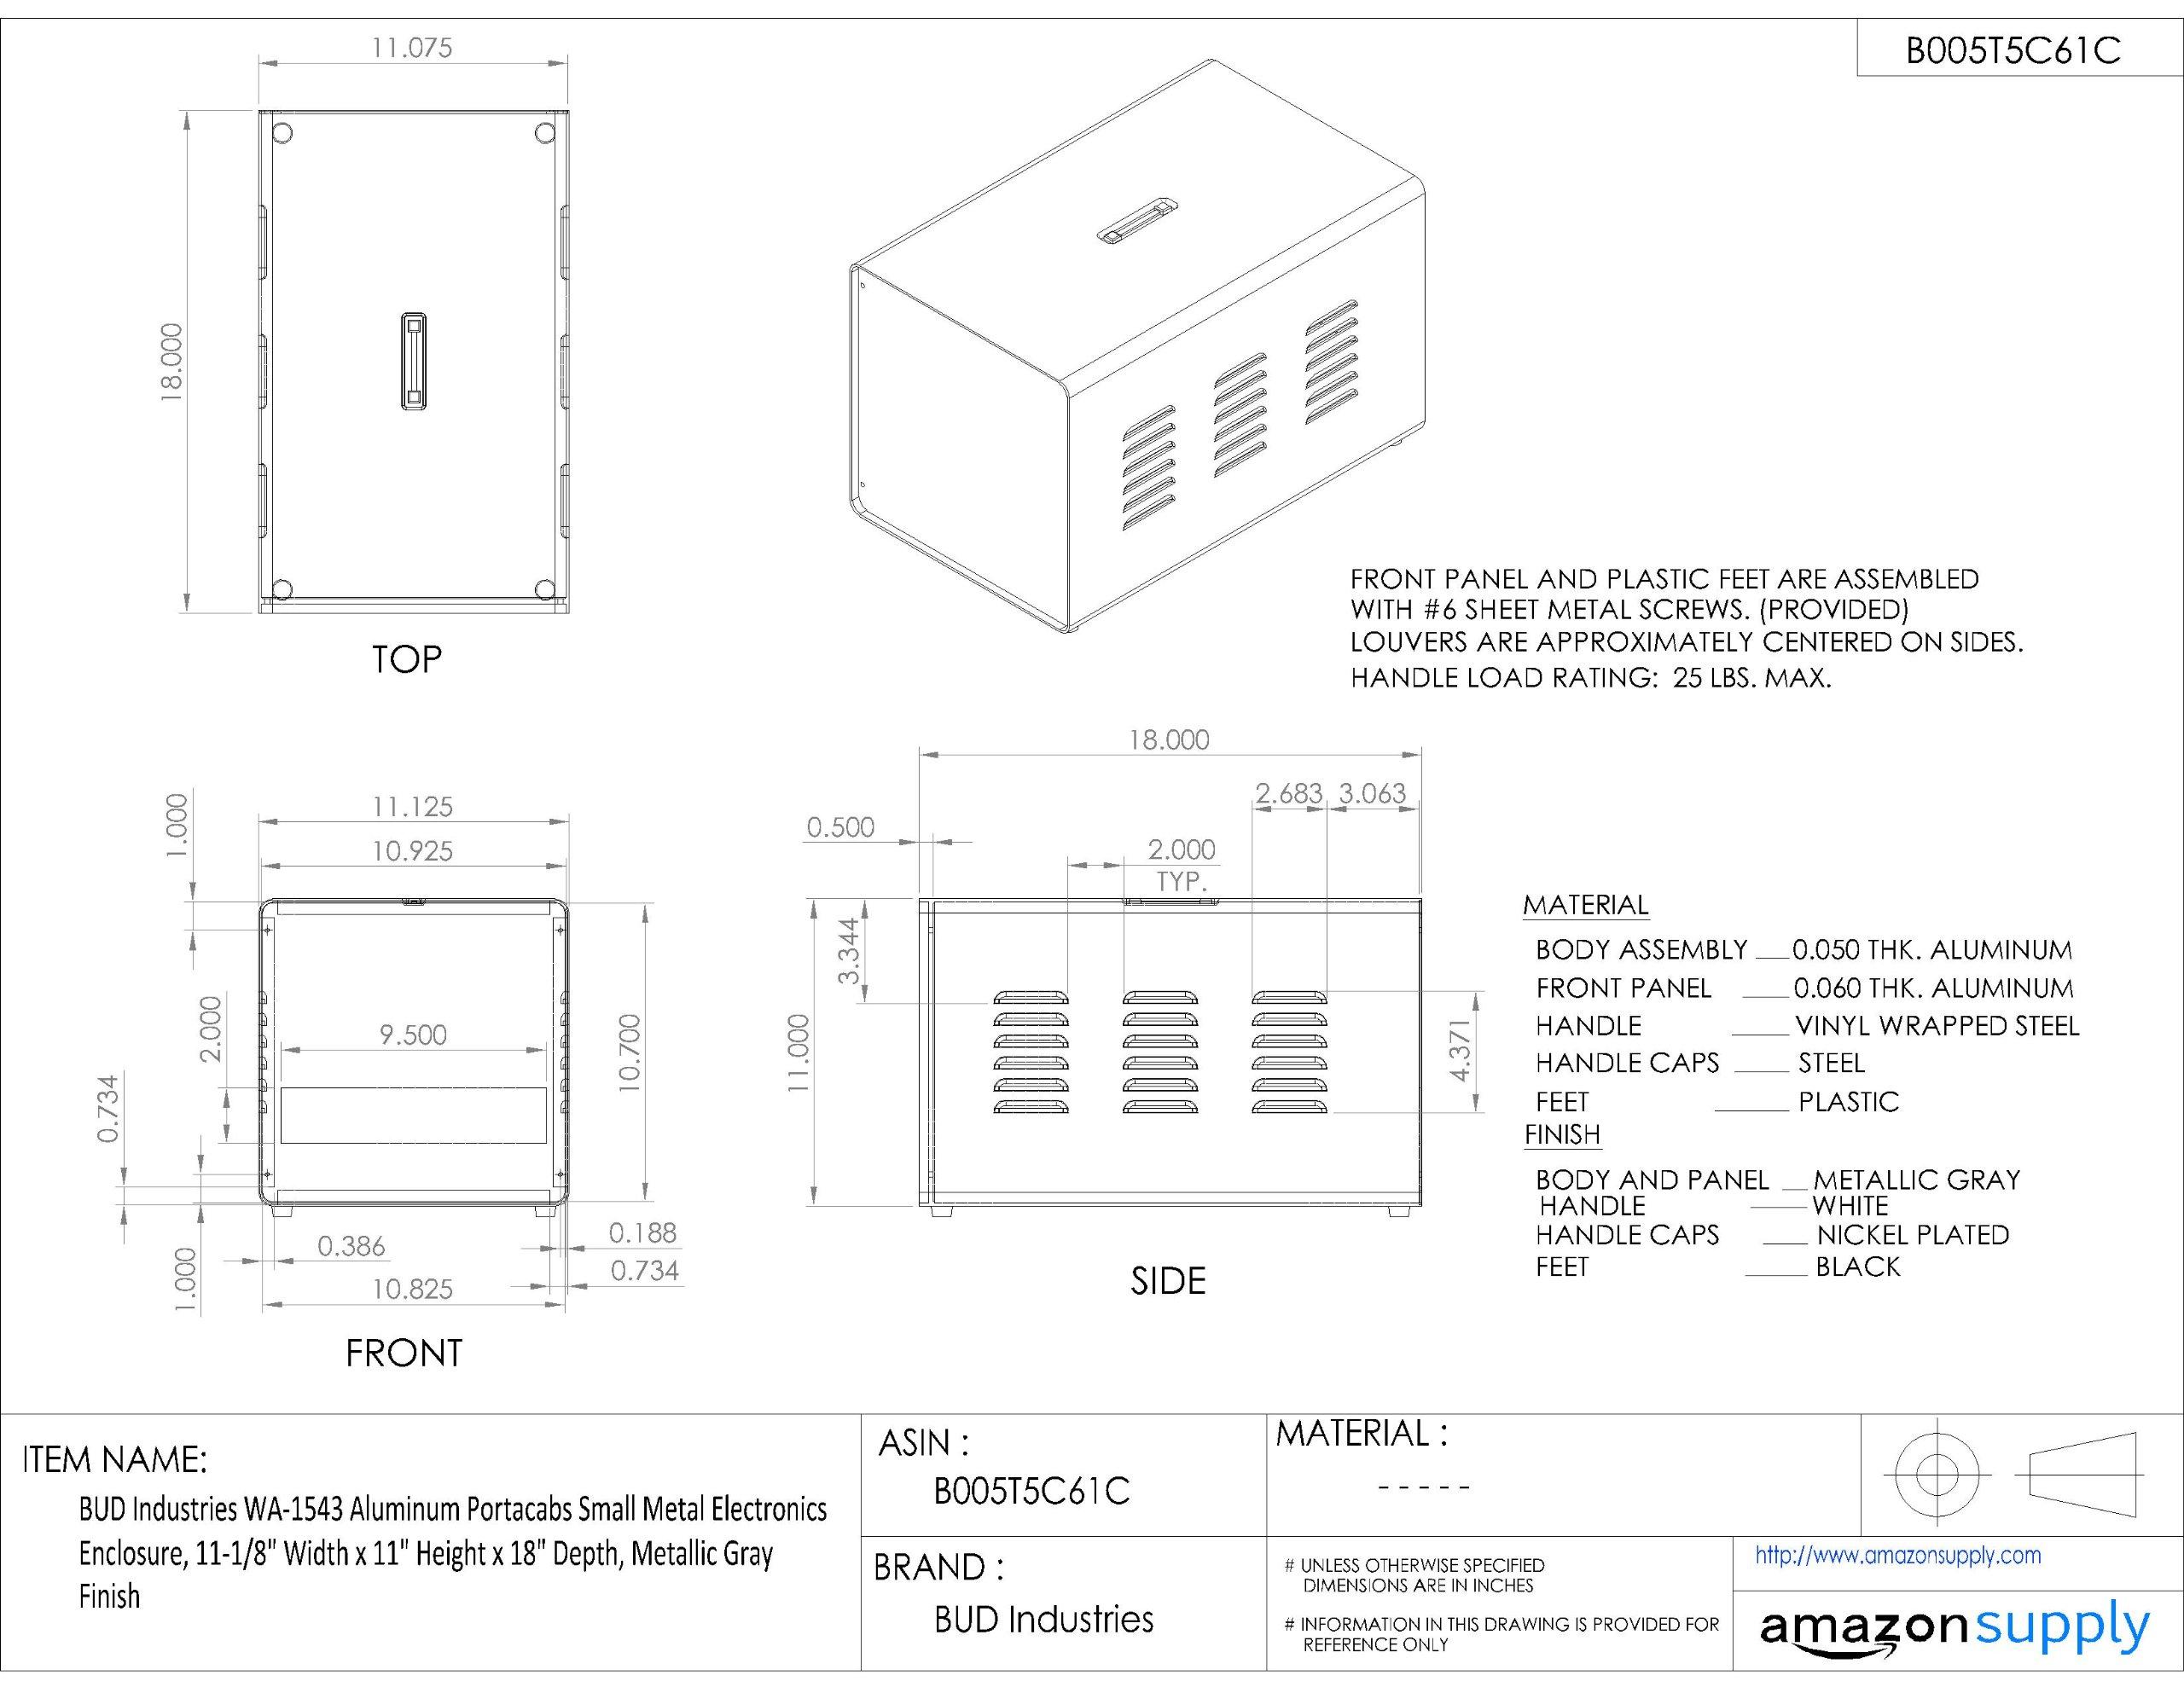 BUD Industries WA-1543 Aluminum Portacabs Small Metal Electronics Enclosure, 11-1/8'' Width x 11'' Height x 18'' Depth, Metallic Gray Finish